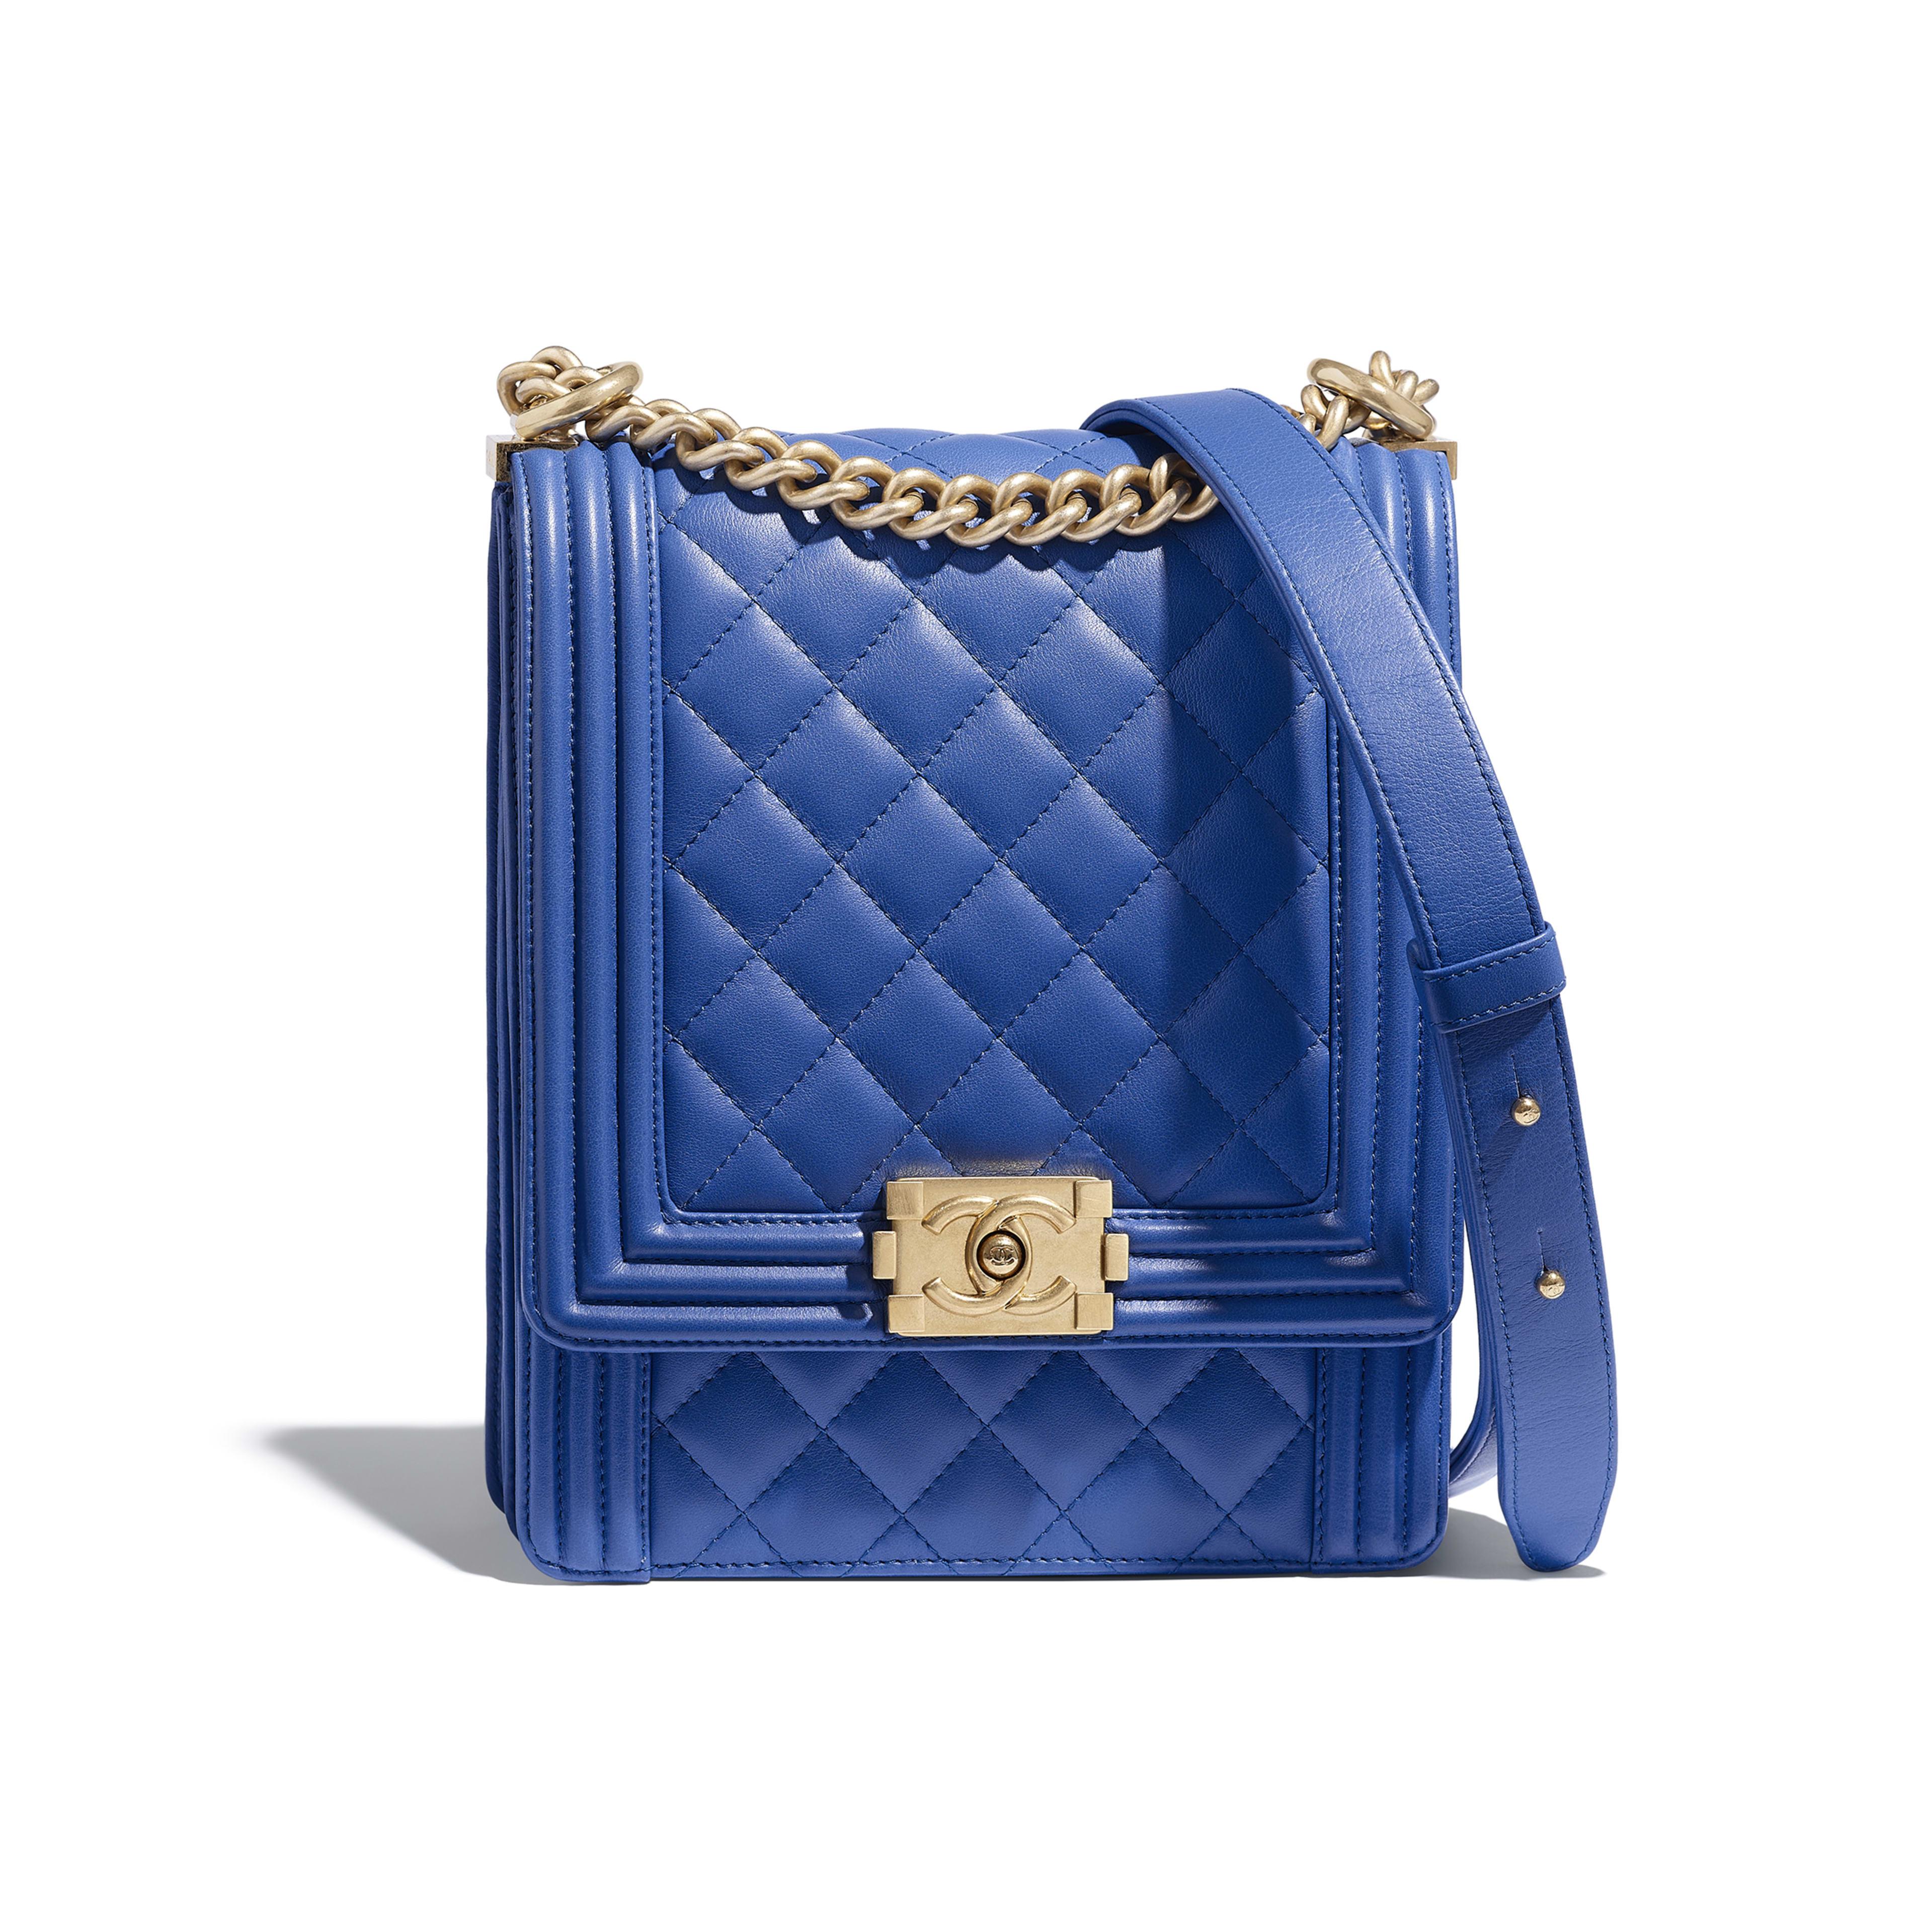 0097791322fe Boy Chanel Handbag - Foto Handbag All Collections Salonagafiya.Com